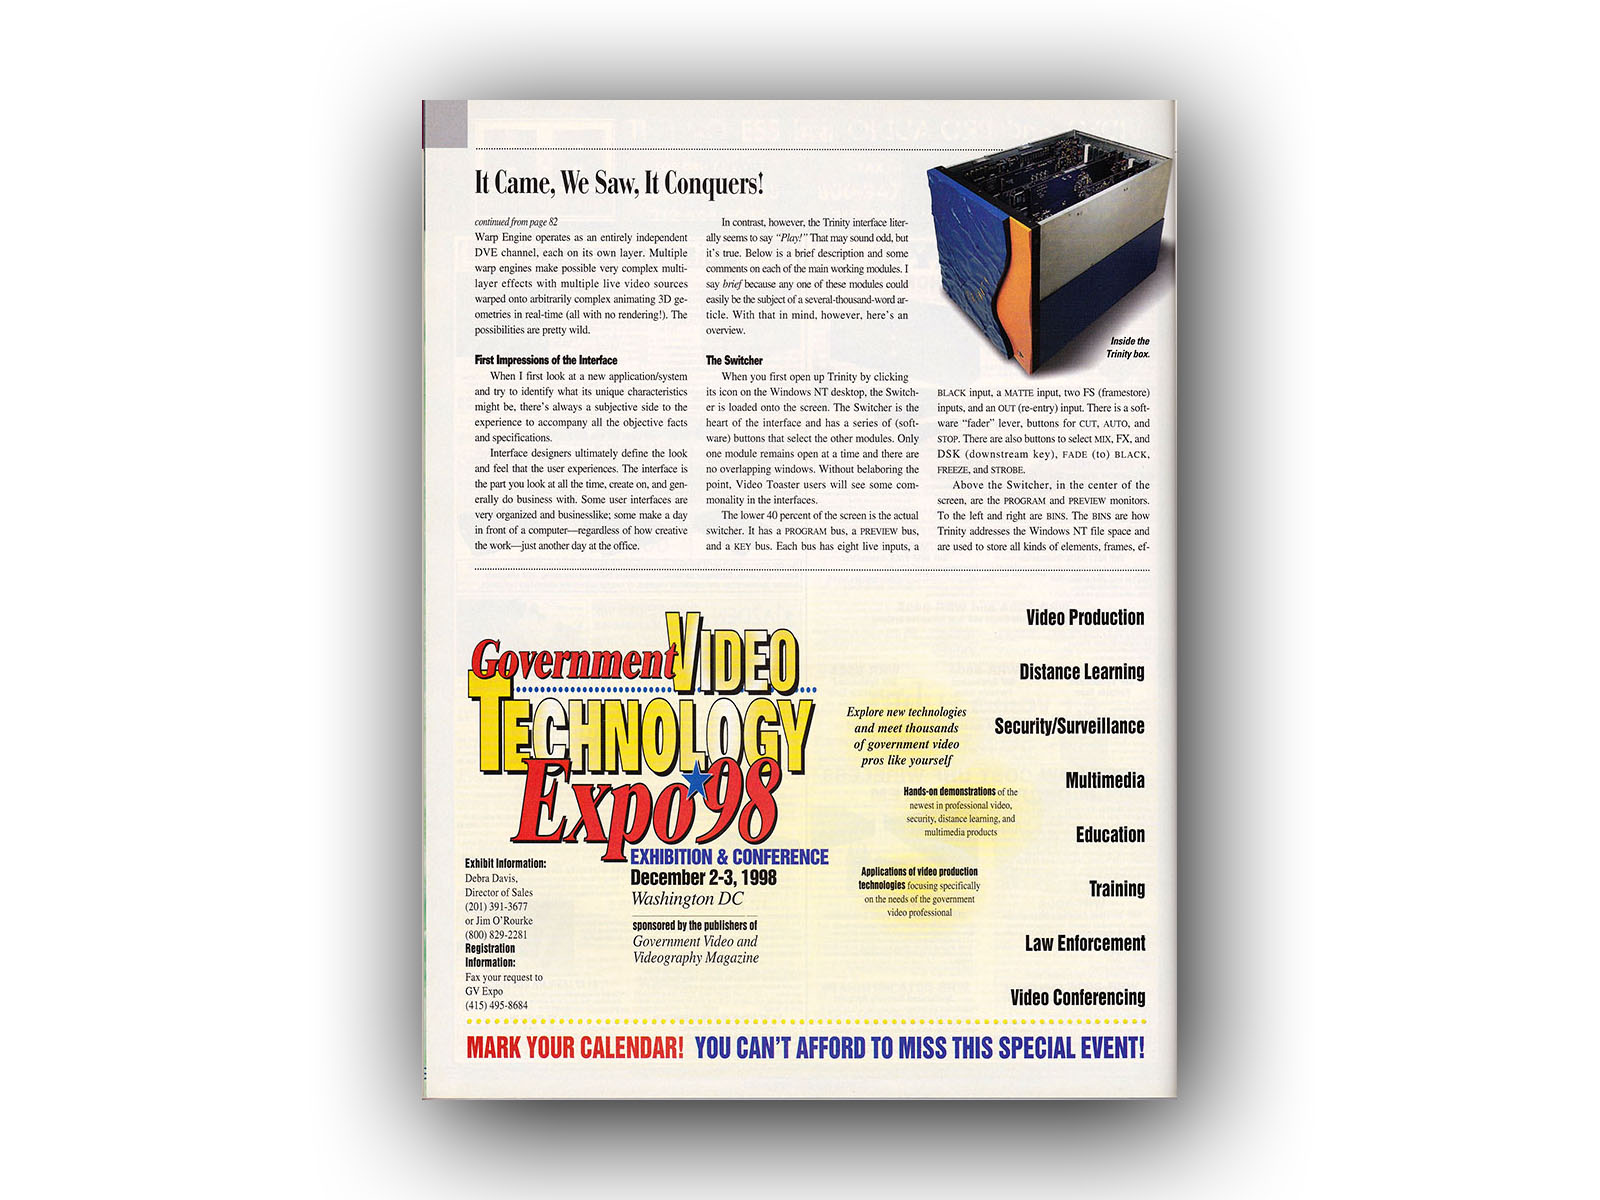 _0008_MagazineVideography-Fall98-P144_web.jpg